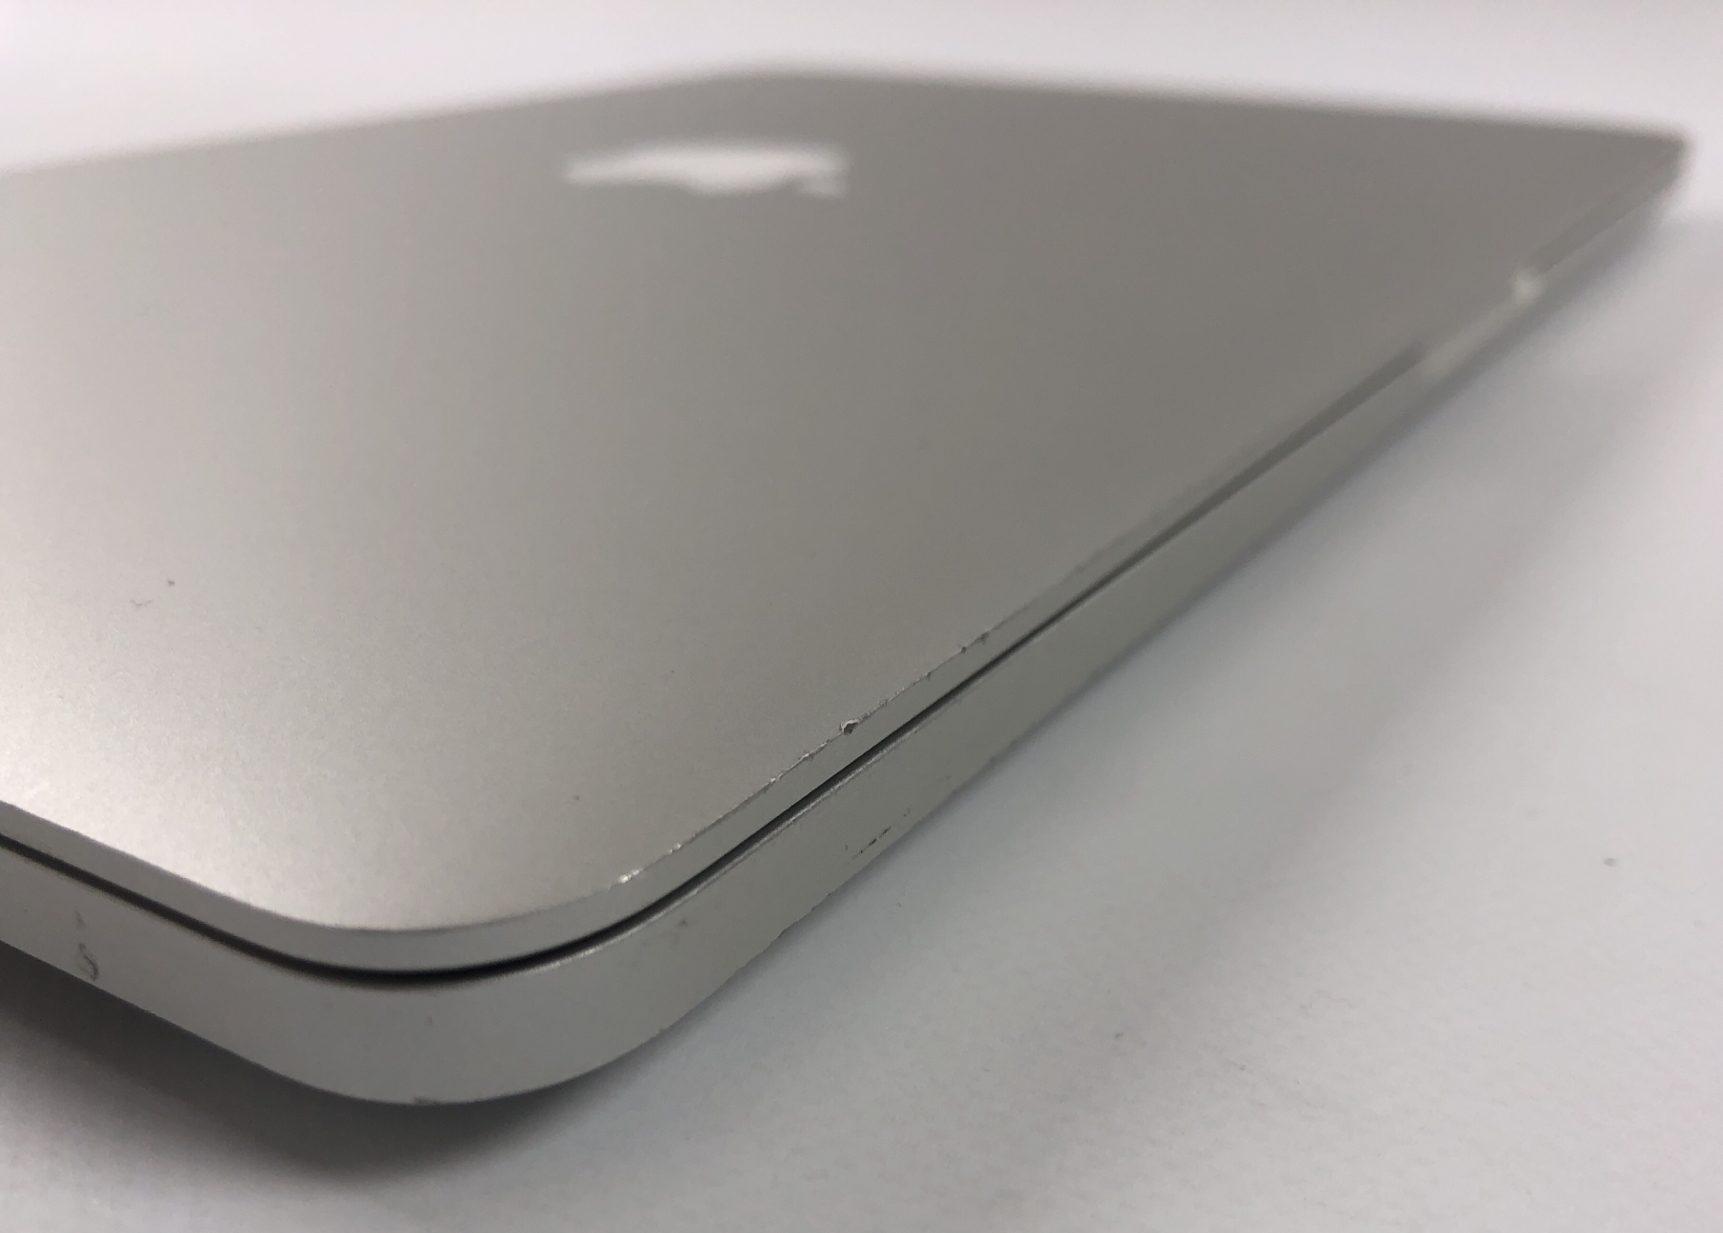 "MacBook Pro Retina 13"" Early 2015 (Intel Core i5 2.9 GHz 8 GB RAM 512 GB SSD), Intel Core i5 2.9 GHz, 8 GB RAM, 512 GB SSD, Kuva 4"